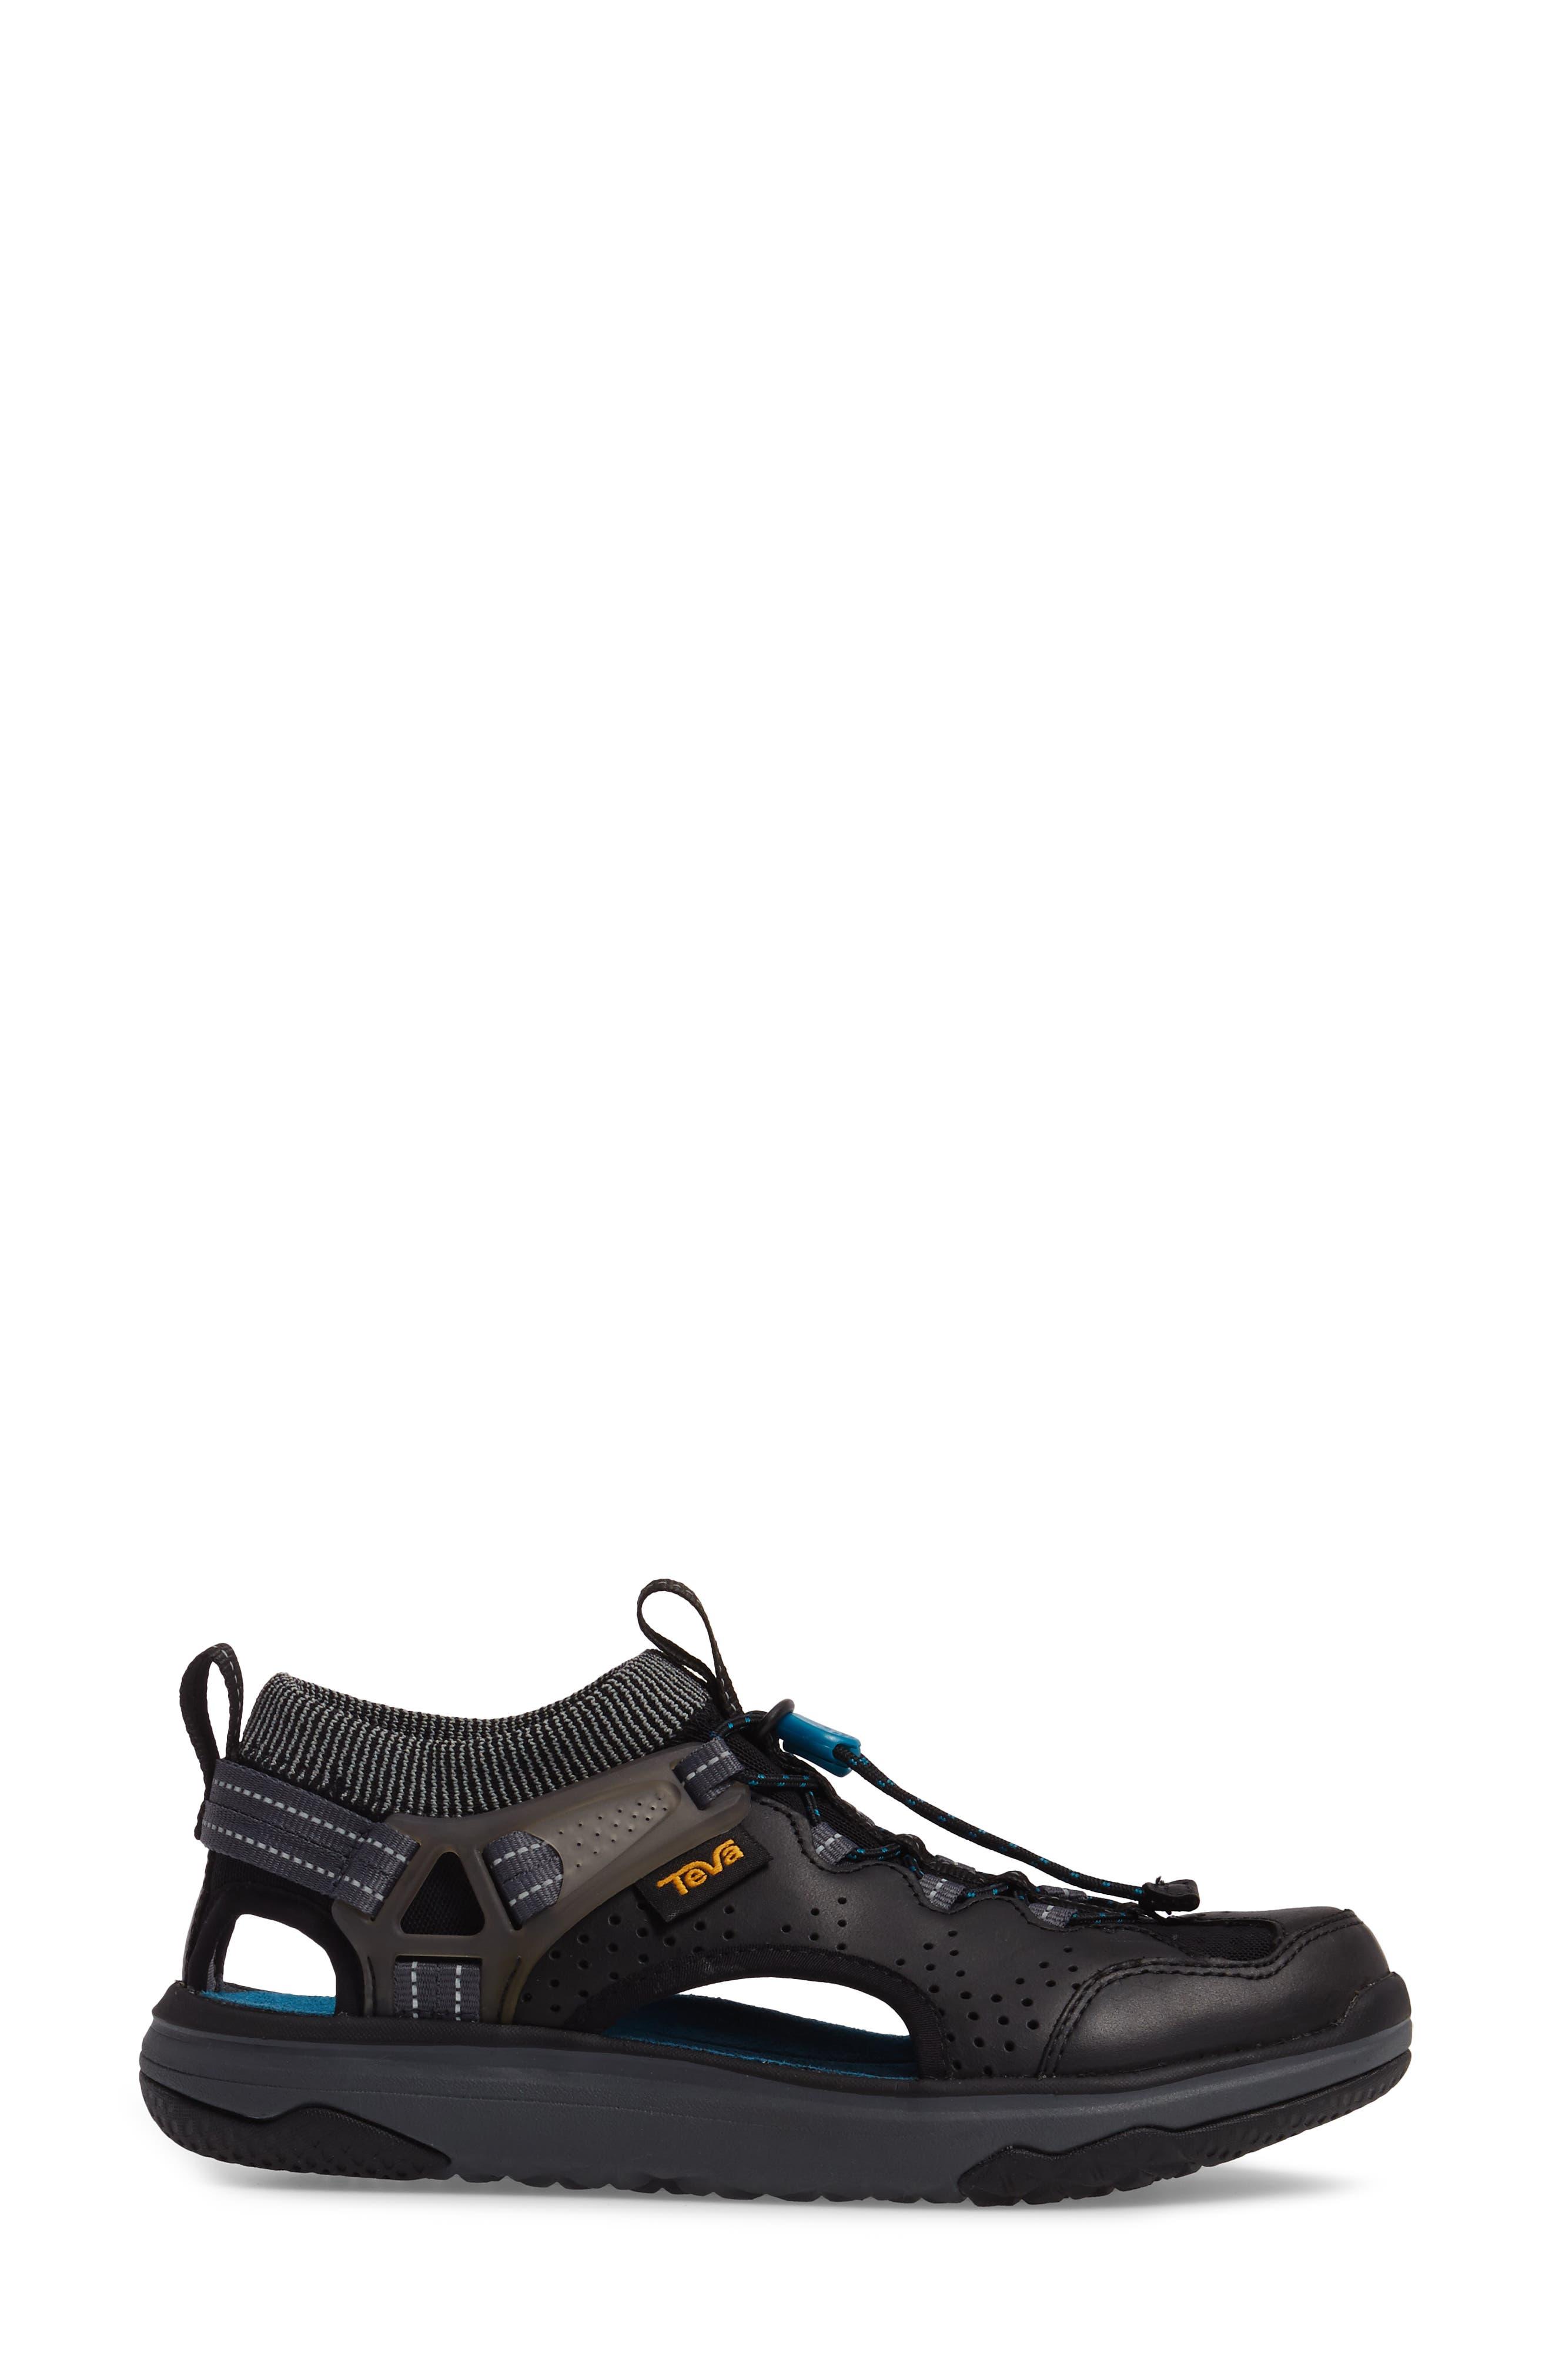 Terra Float Travel Sandal,                             Alternate thumbnail 3, color,                             Black Leather